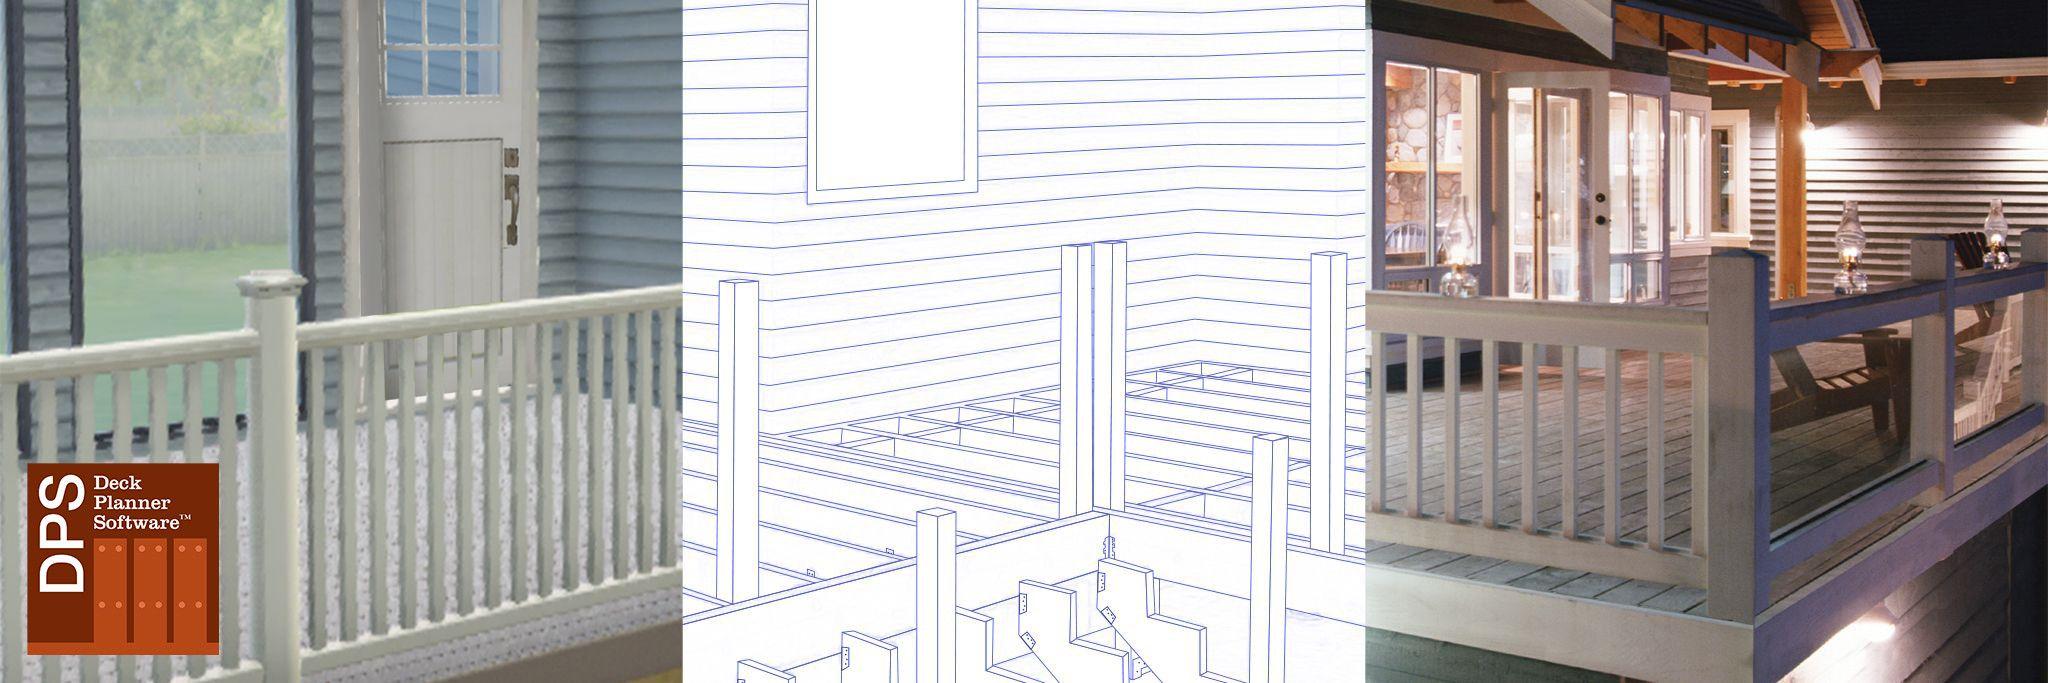 Design Your Dream Deck Contest